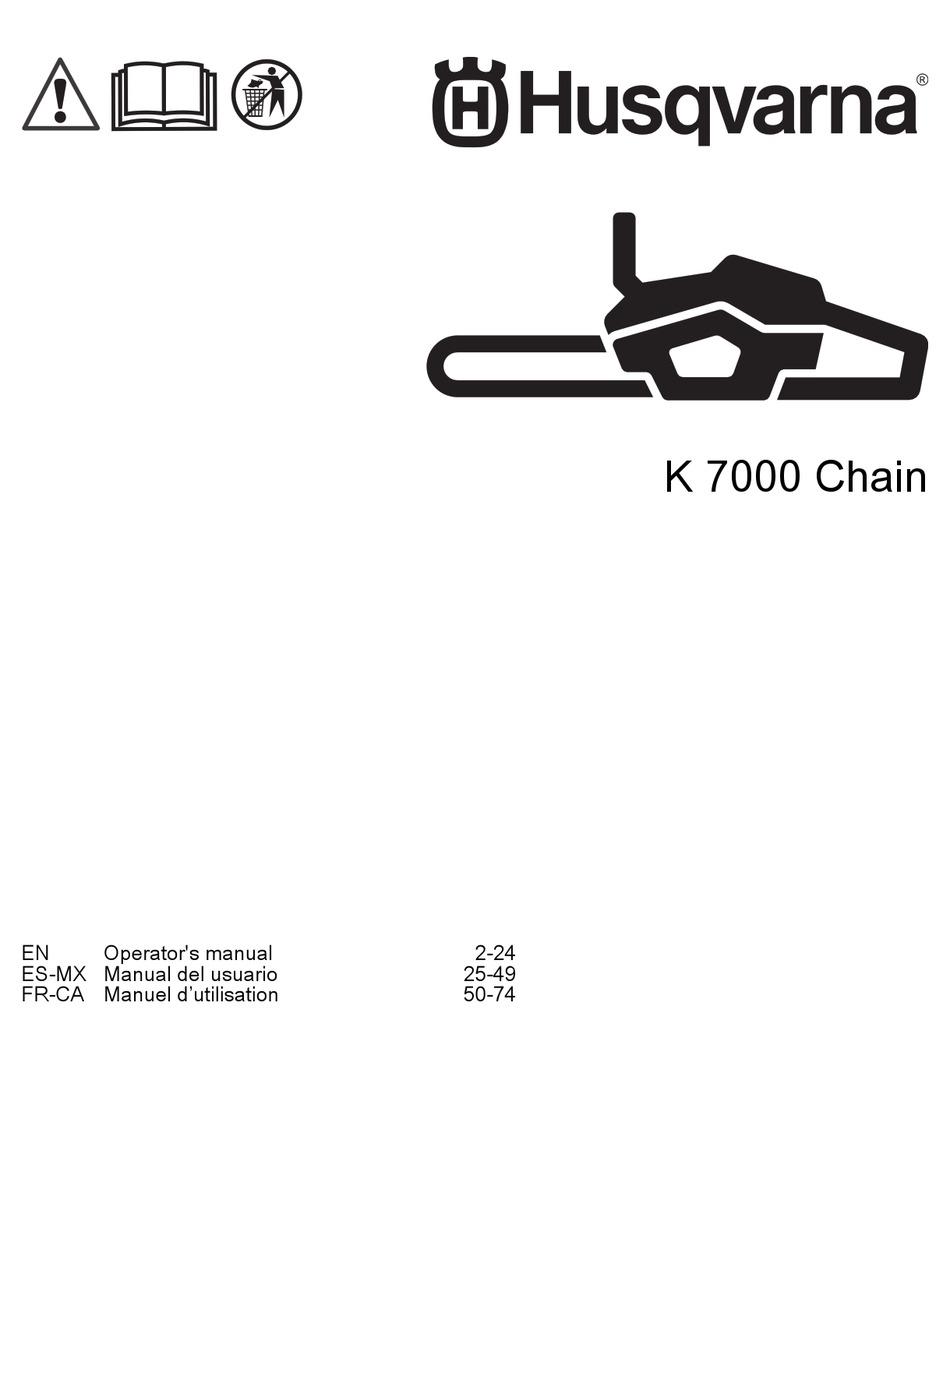 HUSQVARNA K 7000 CHAIN OPERATOR'S MANUAL Pdf Download